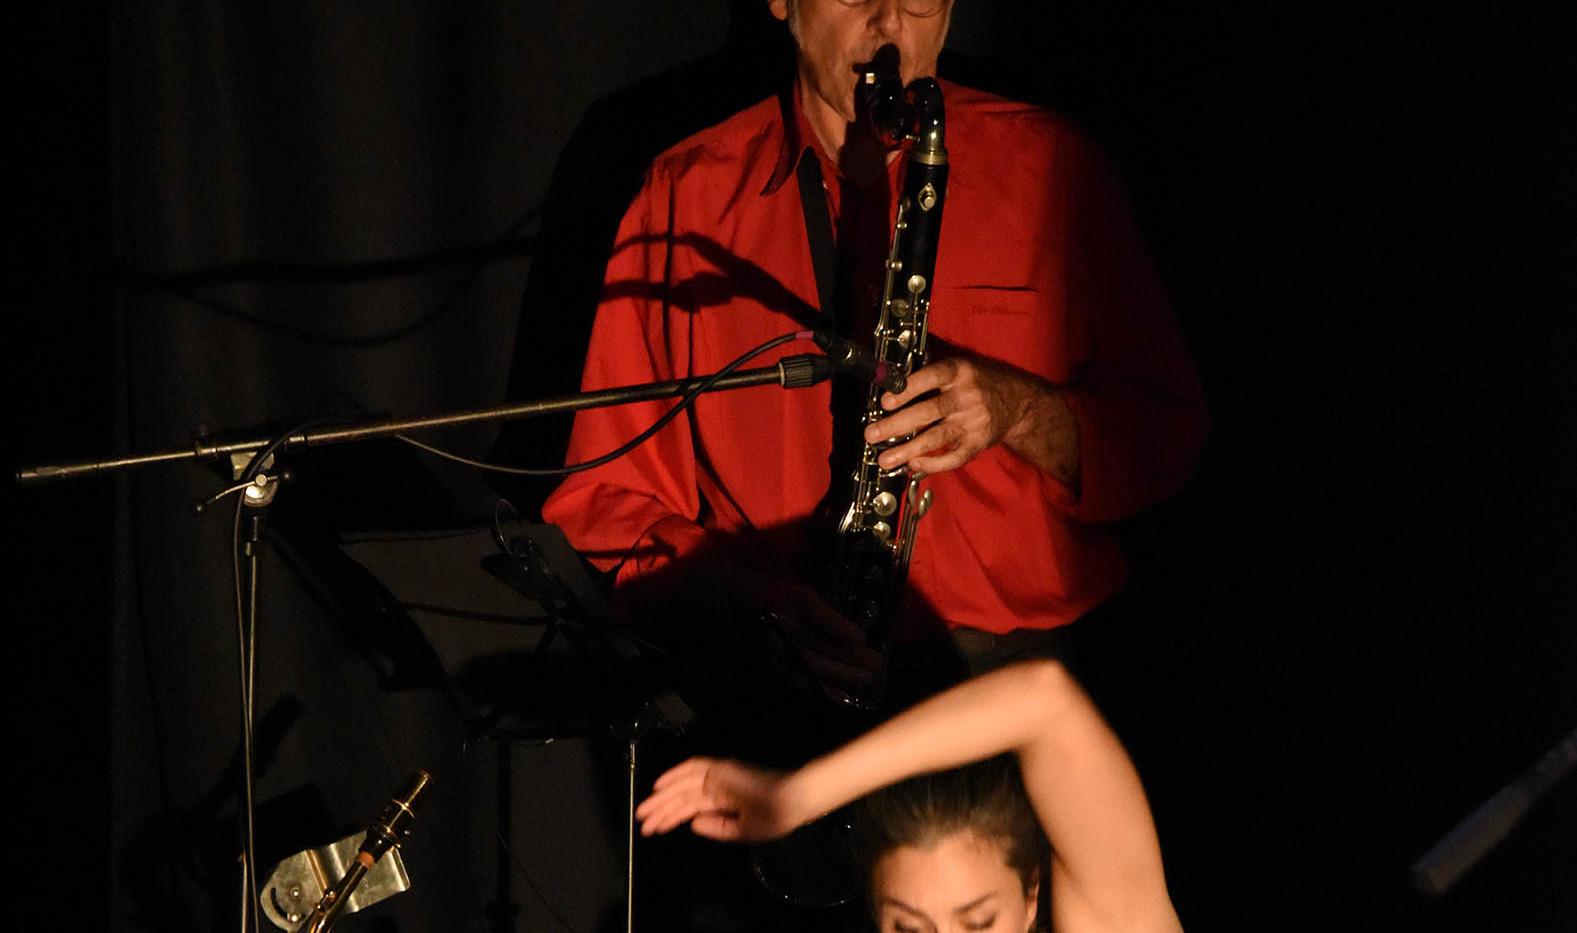 Helvète On The Ground Sax et Danse